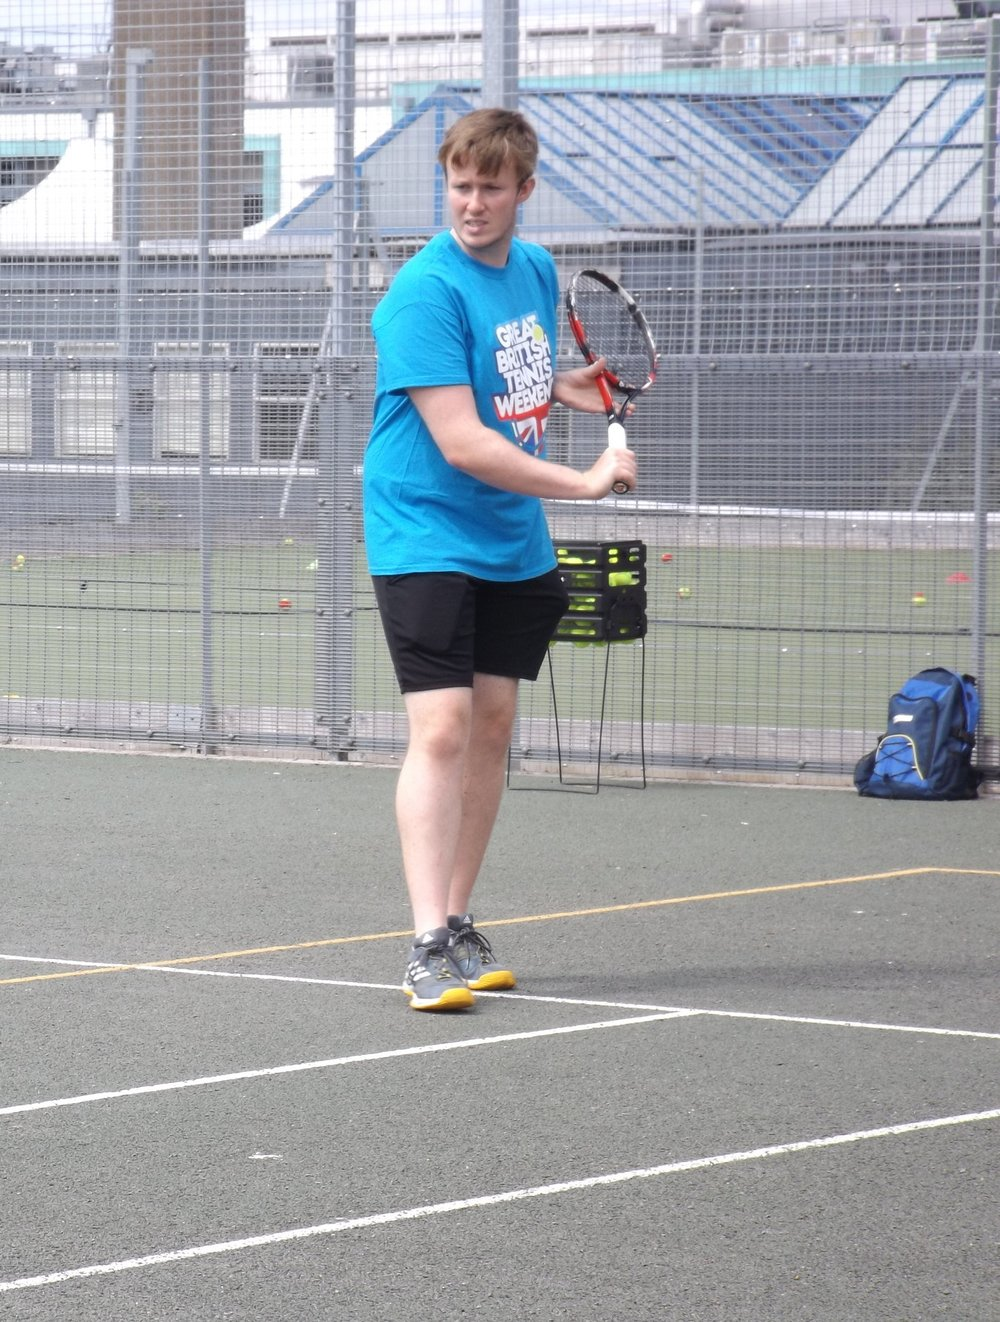 Hi!I'm James - I'm an LTA Level 2 Tennis Coach.Date Joined: September 2017Status: Active